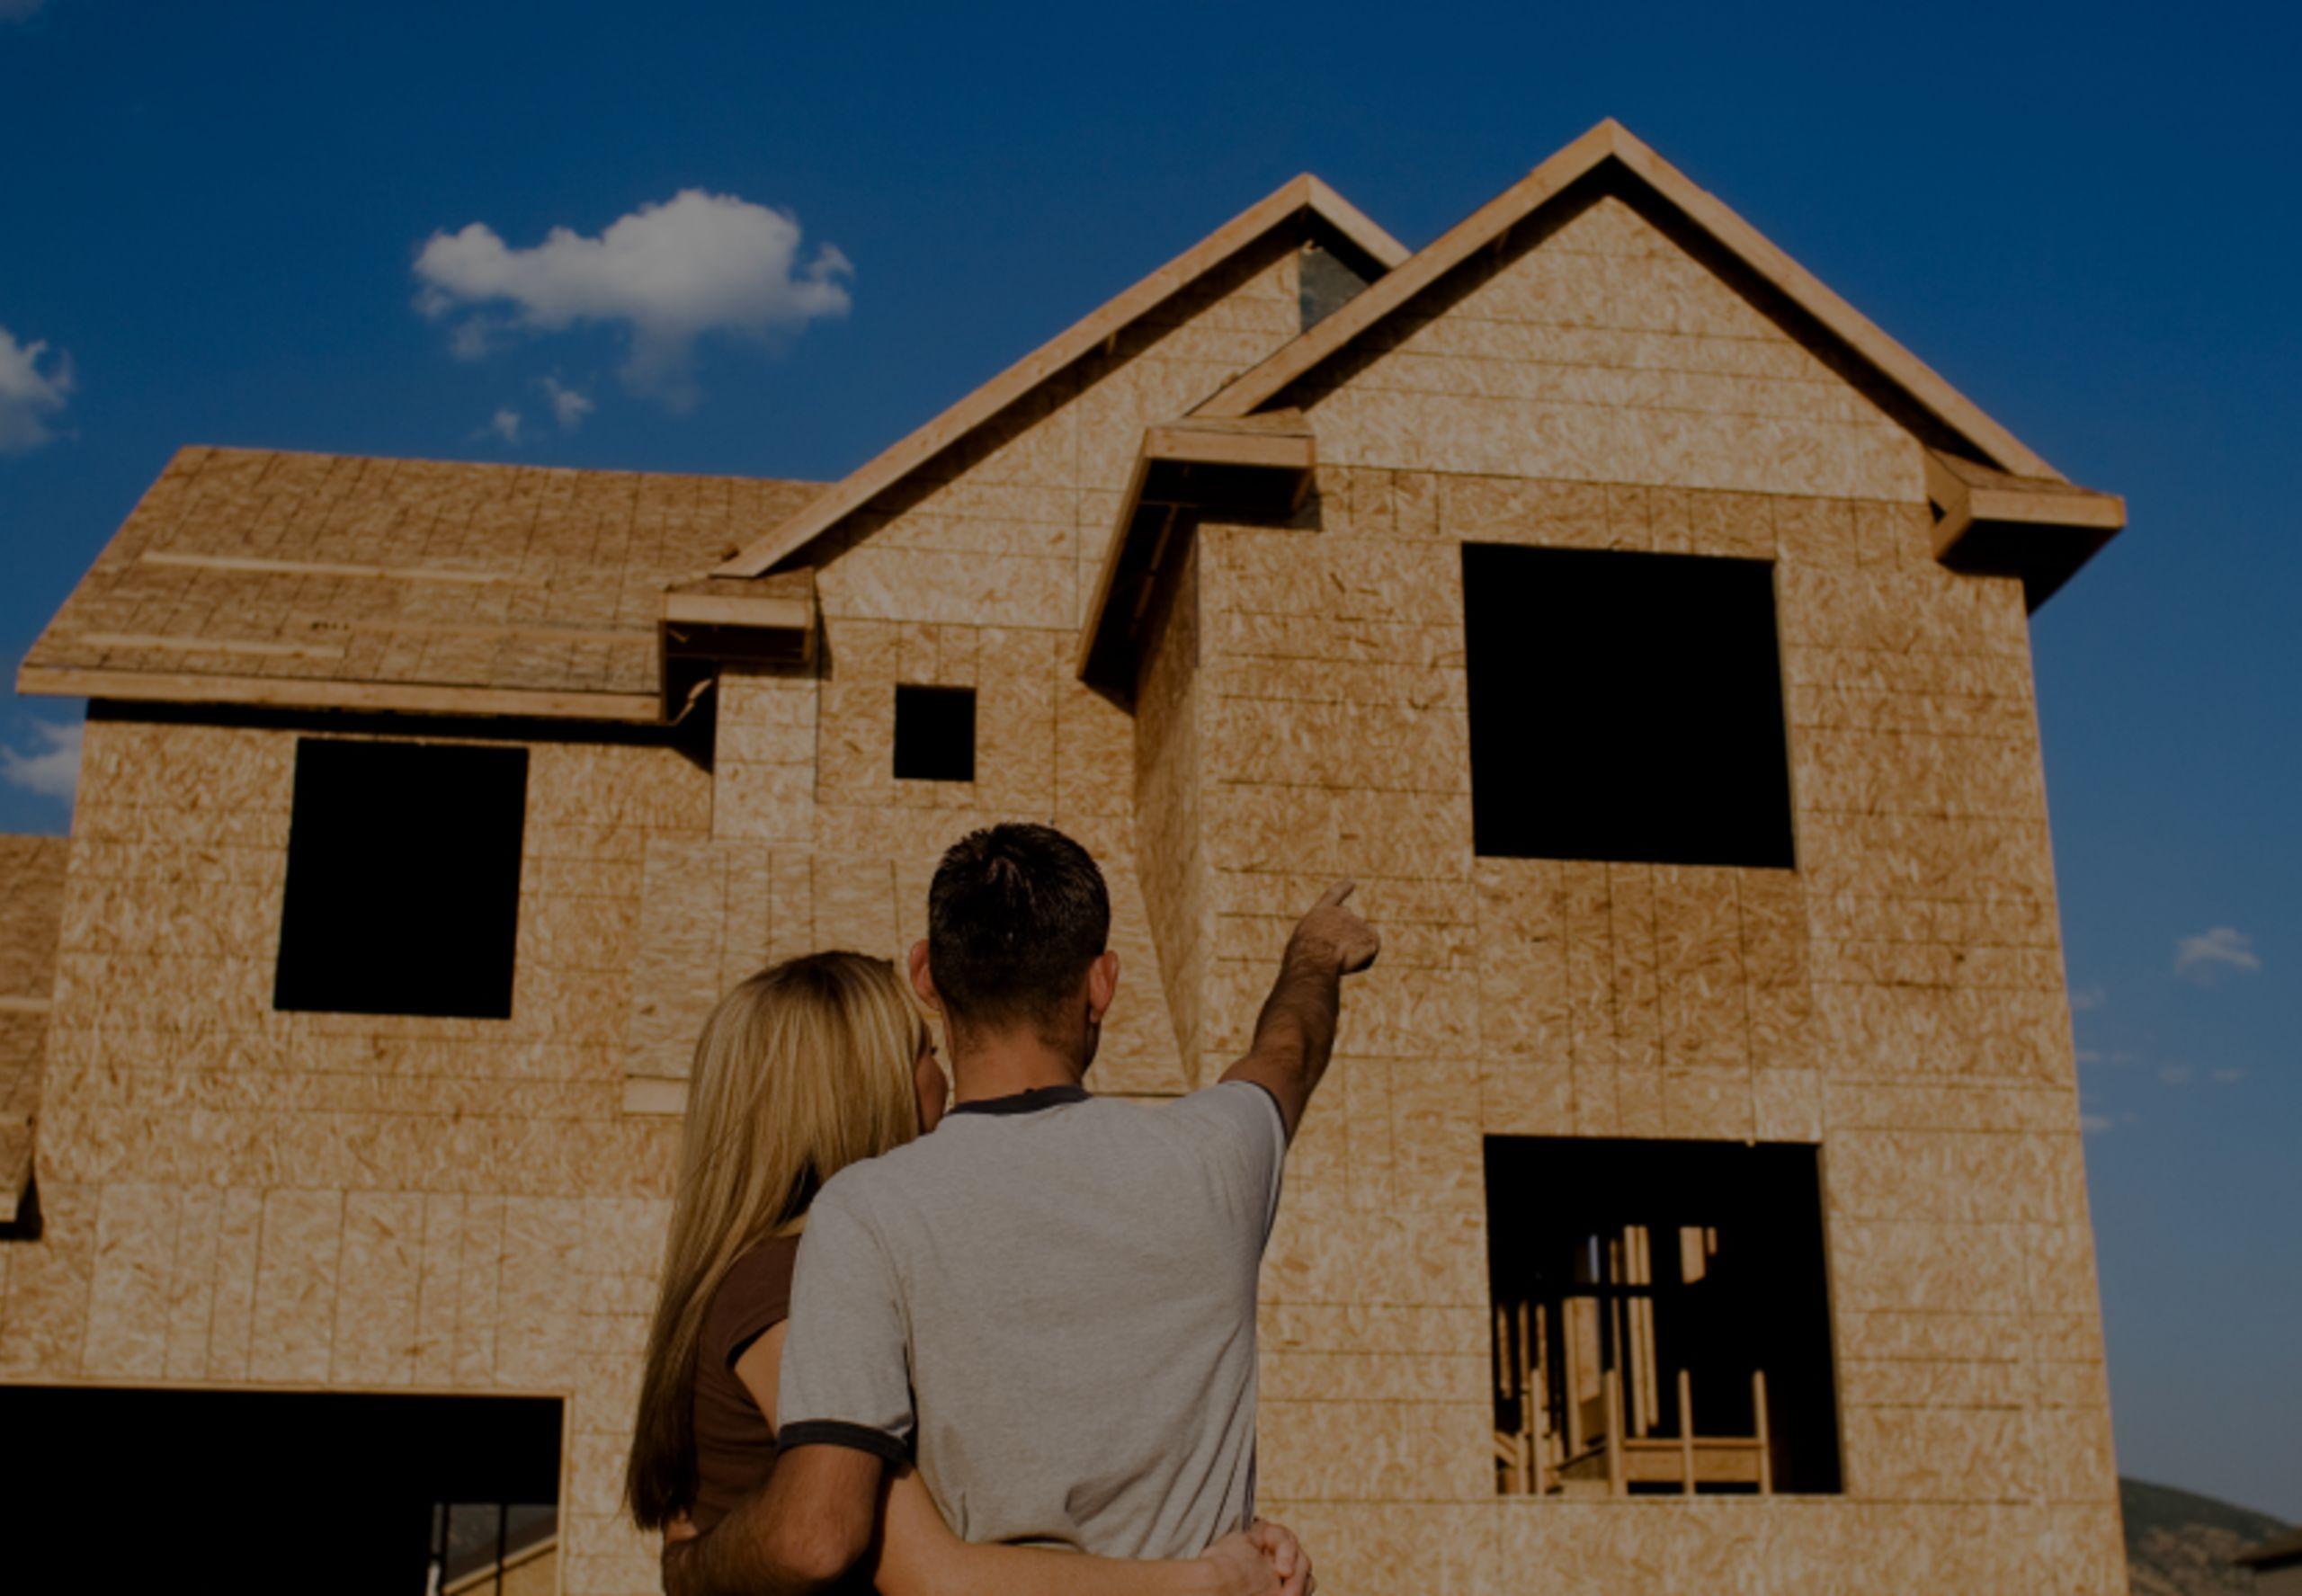 New Construction Homes Spanish Fort Al